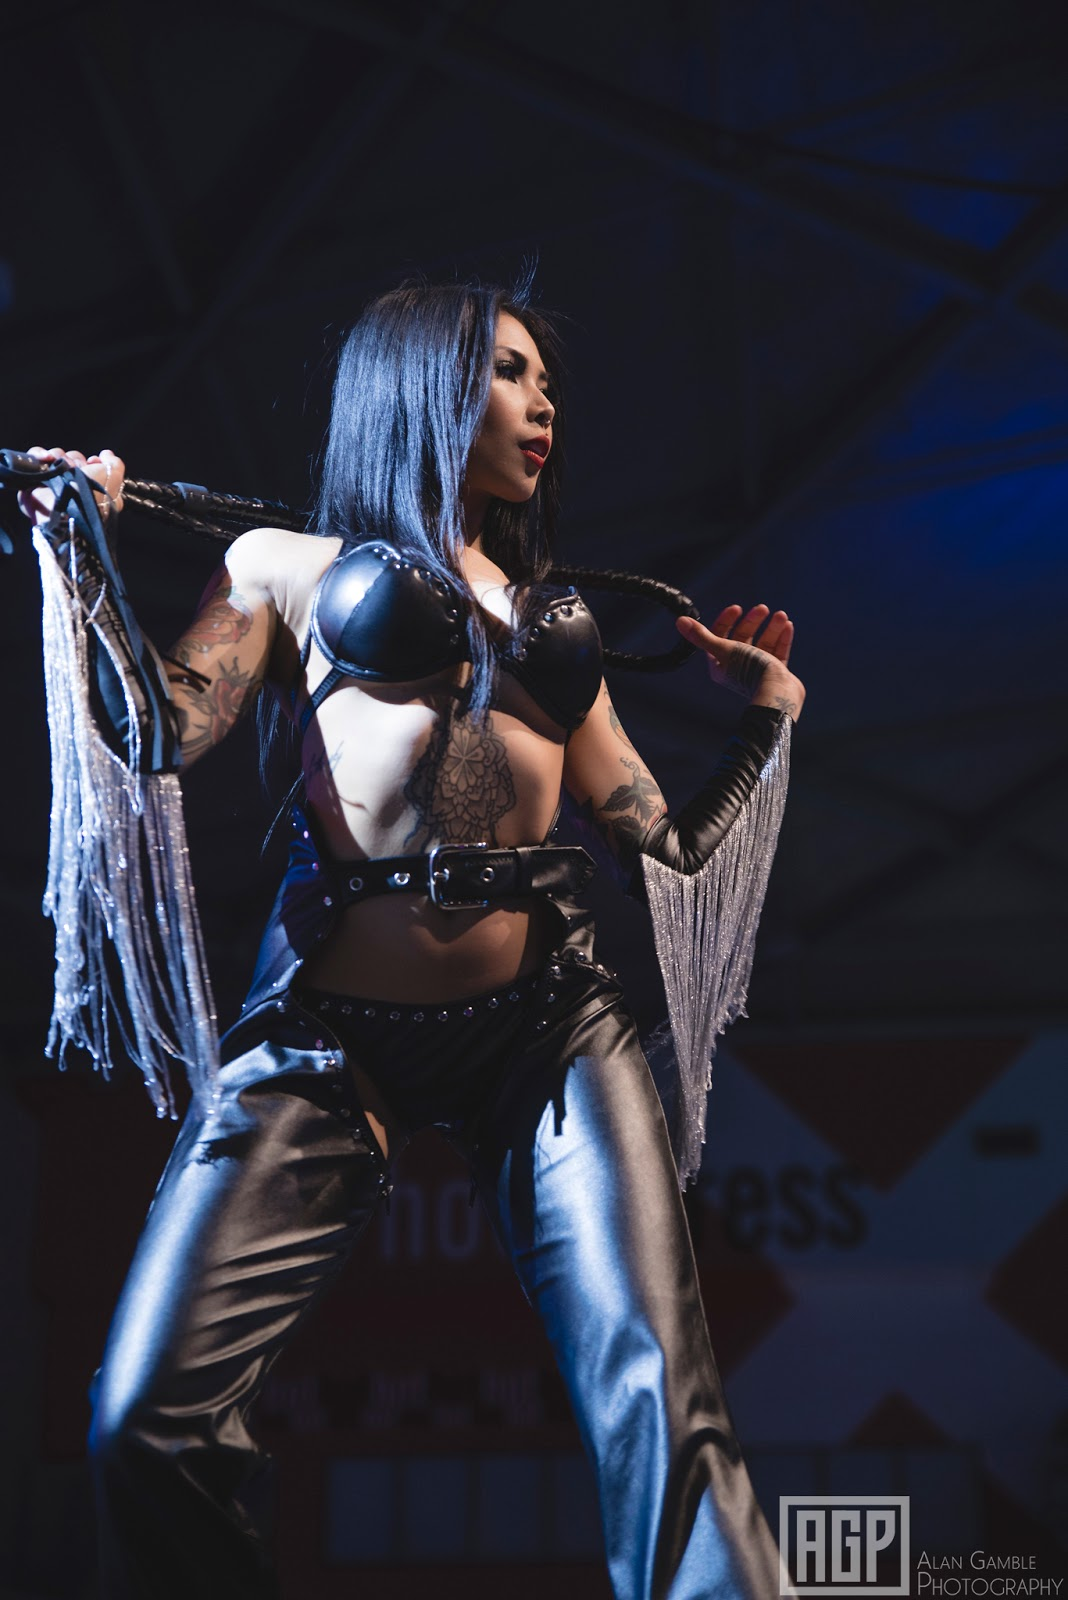 Sexpo Brisbane 2019 - Friday (nsfw)